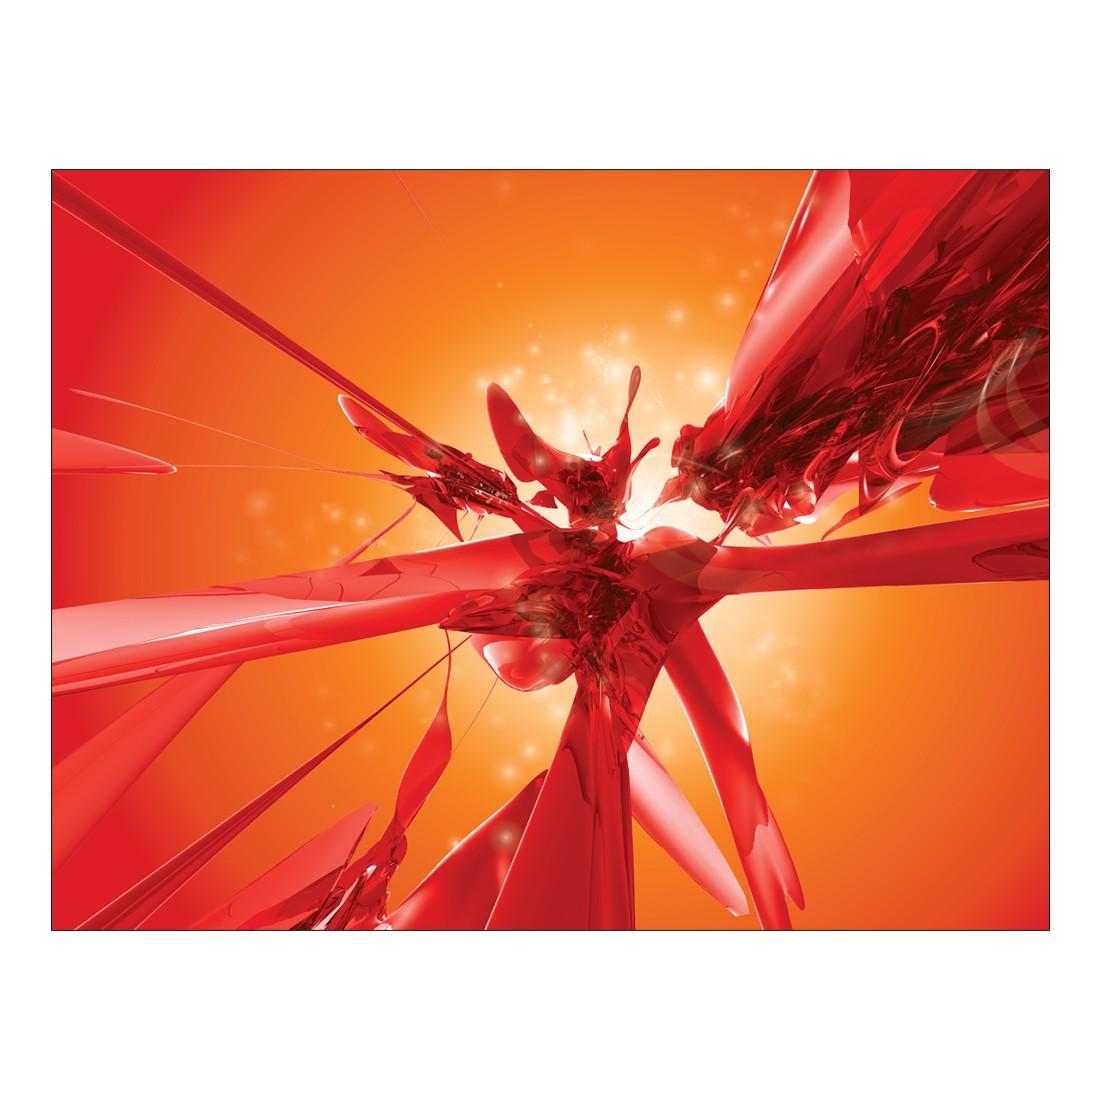 Leinwandbild Design Rot – 100 x 75cm, Gallery of Innovative Art günstig